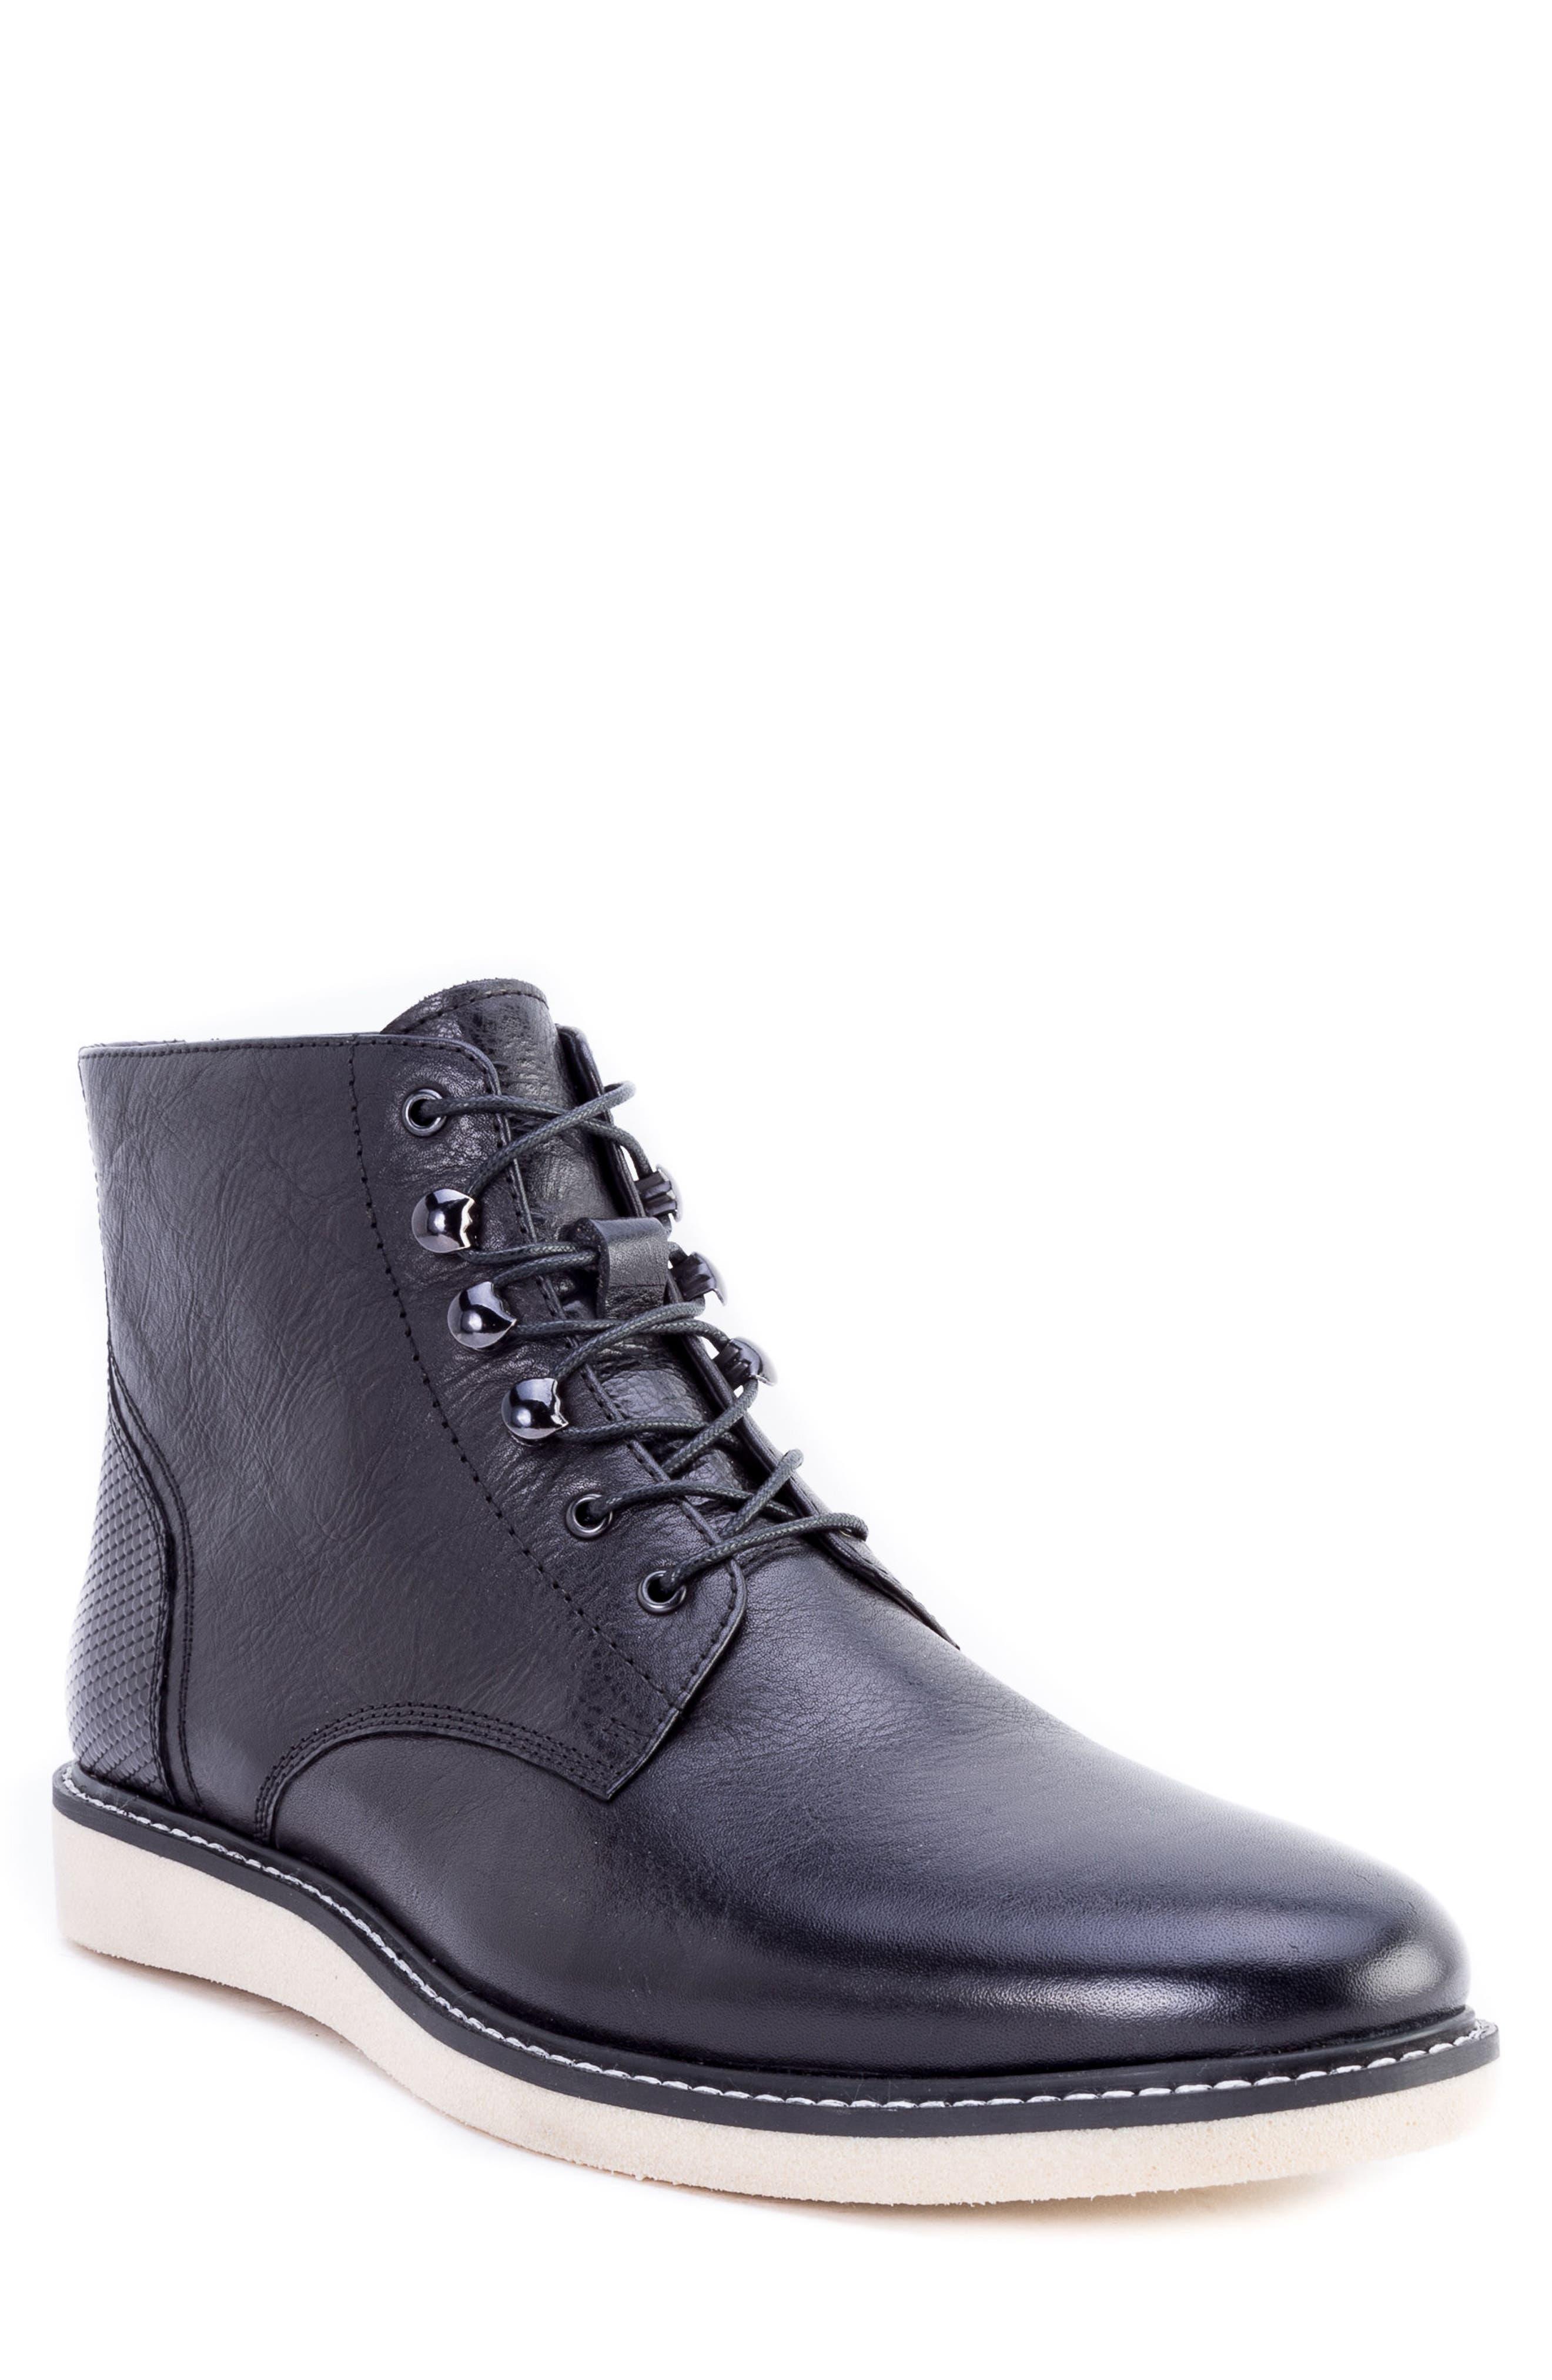 Finch Plain Toe Boot,                         Main,                         color, BLACK LEATHER